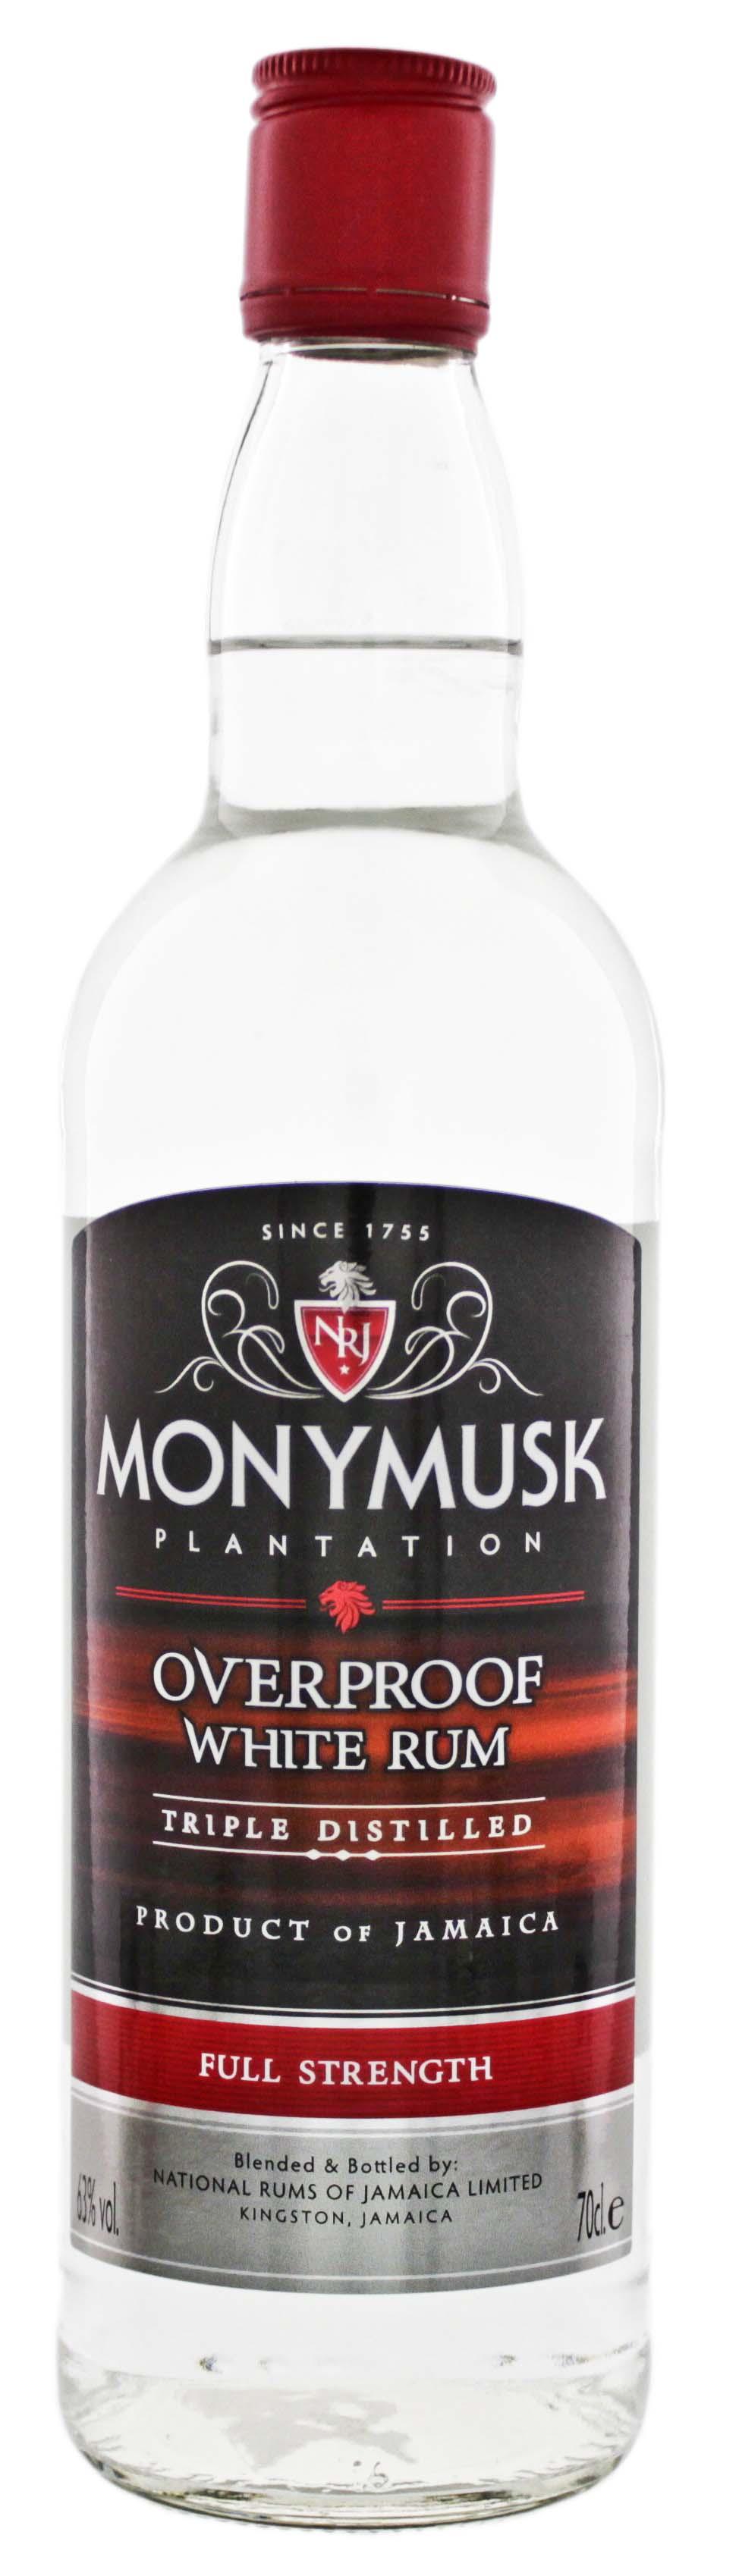 Monymusk Plantation Overproof White Rum 0,7L